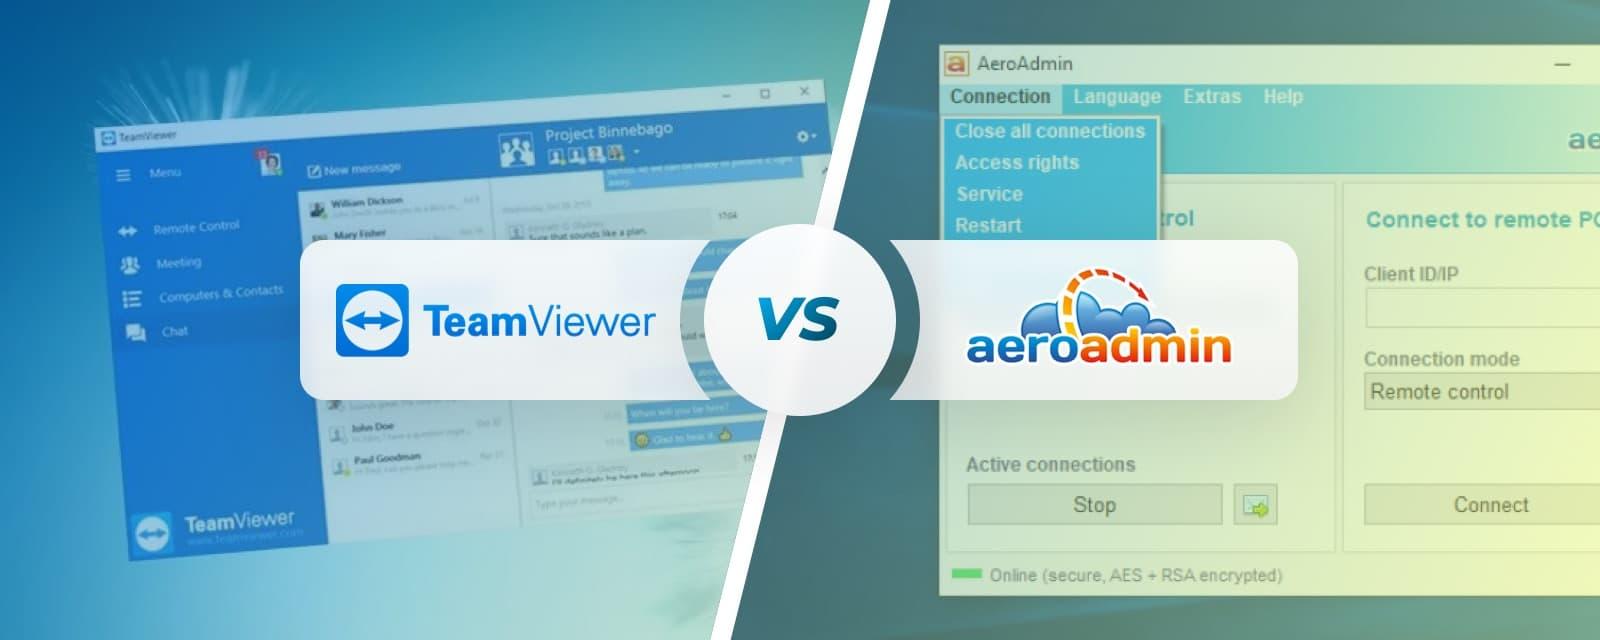 AeroAdmin vs TeamViewer